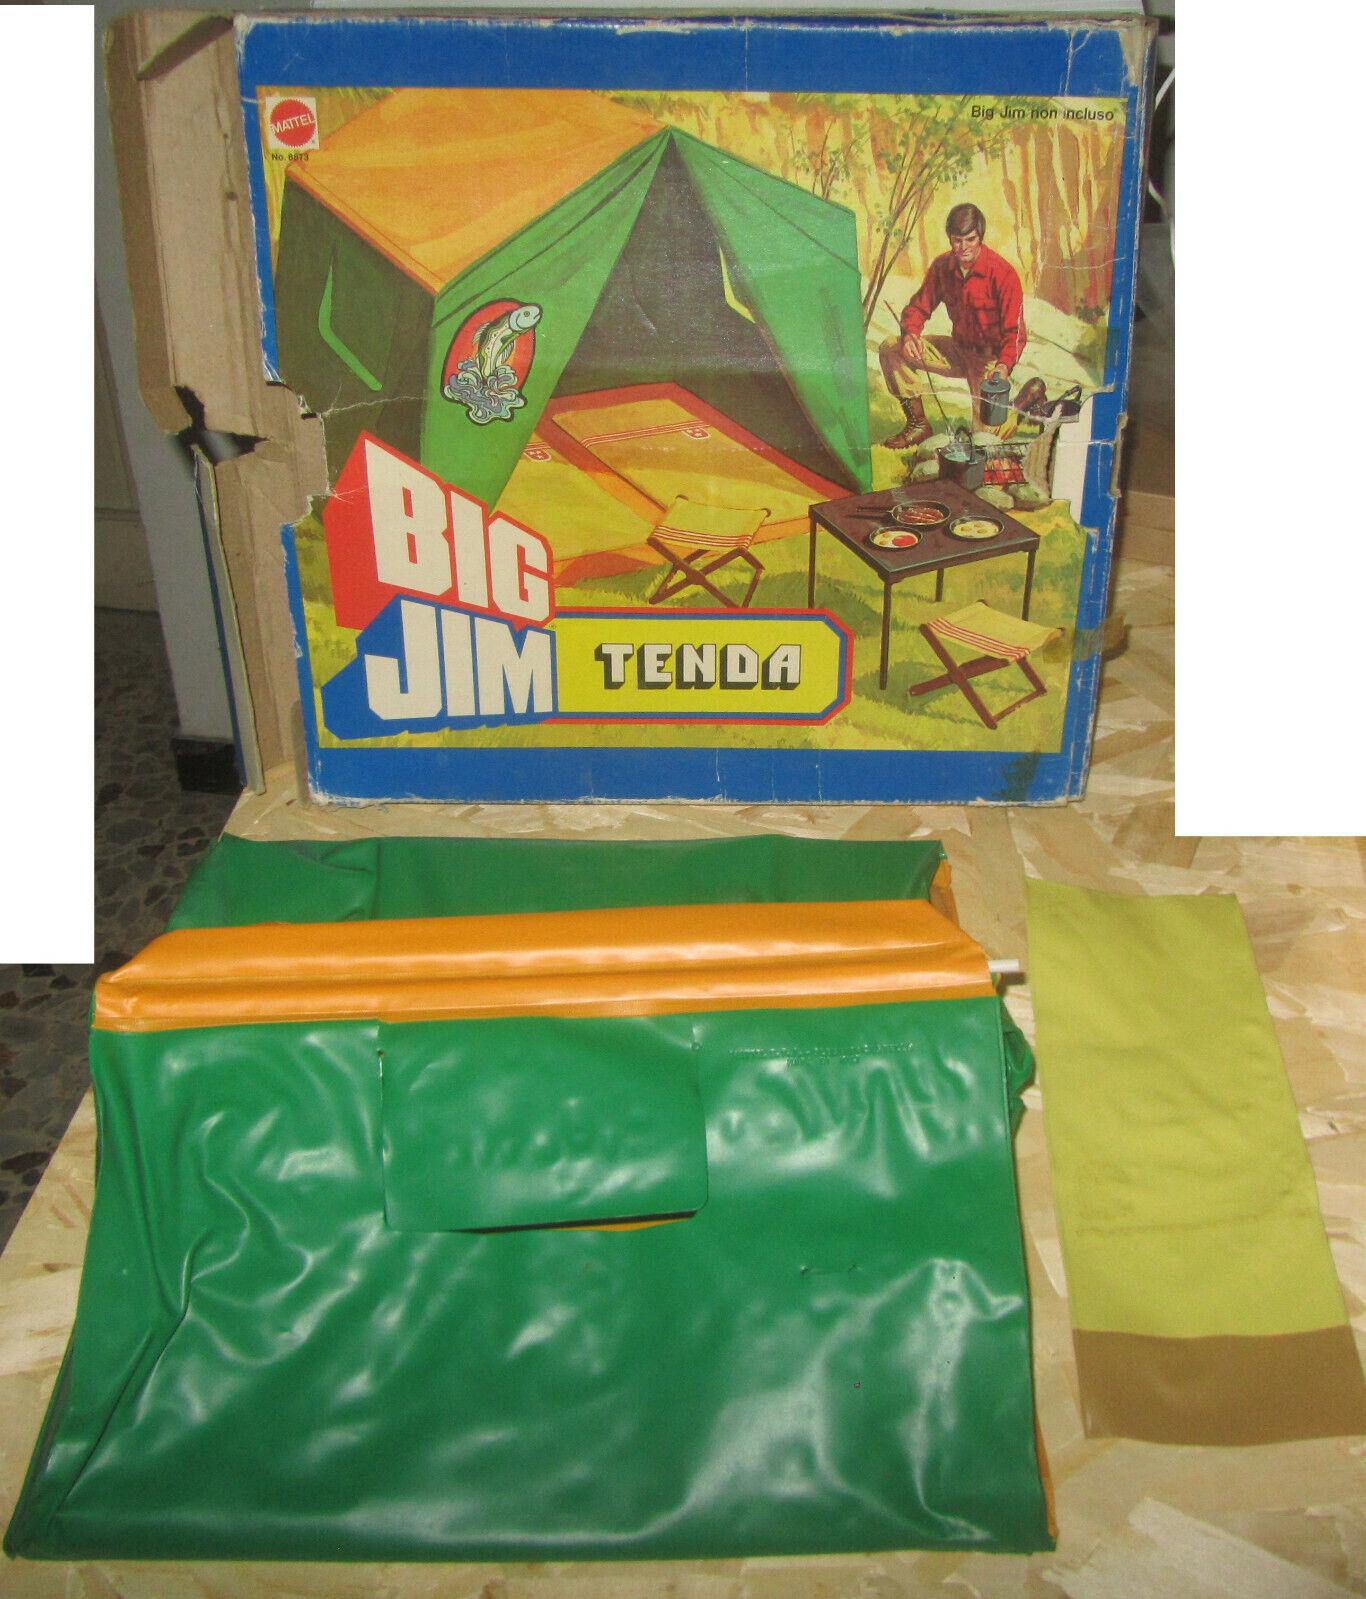 BIG JIM MATTEL Tenda 8873 prima versione INCOMPLETA SPESE GRATIS